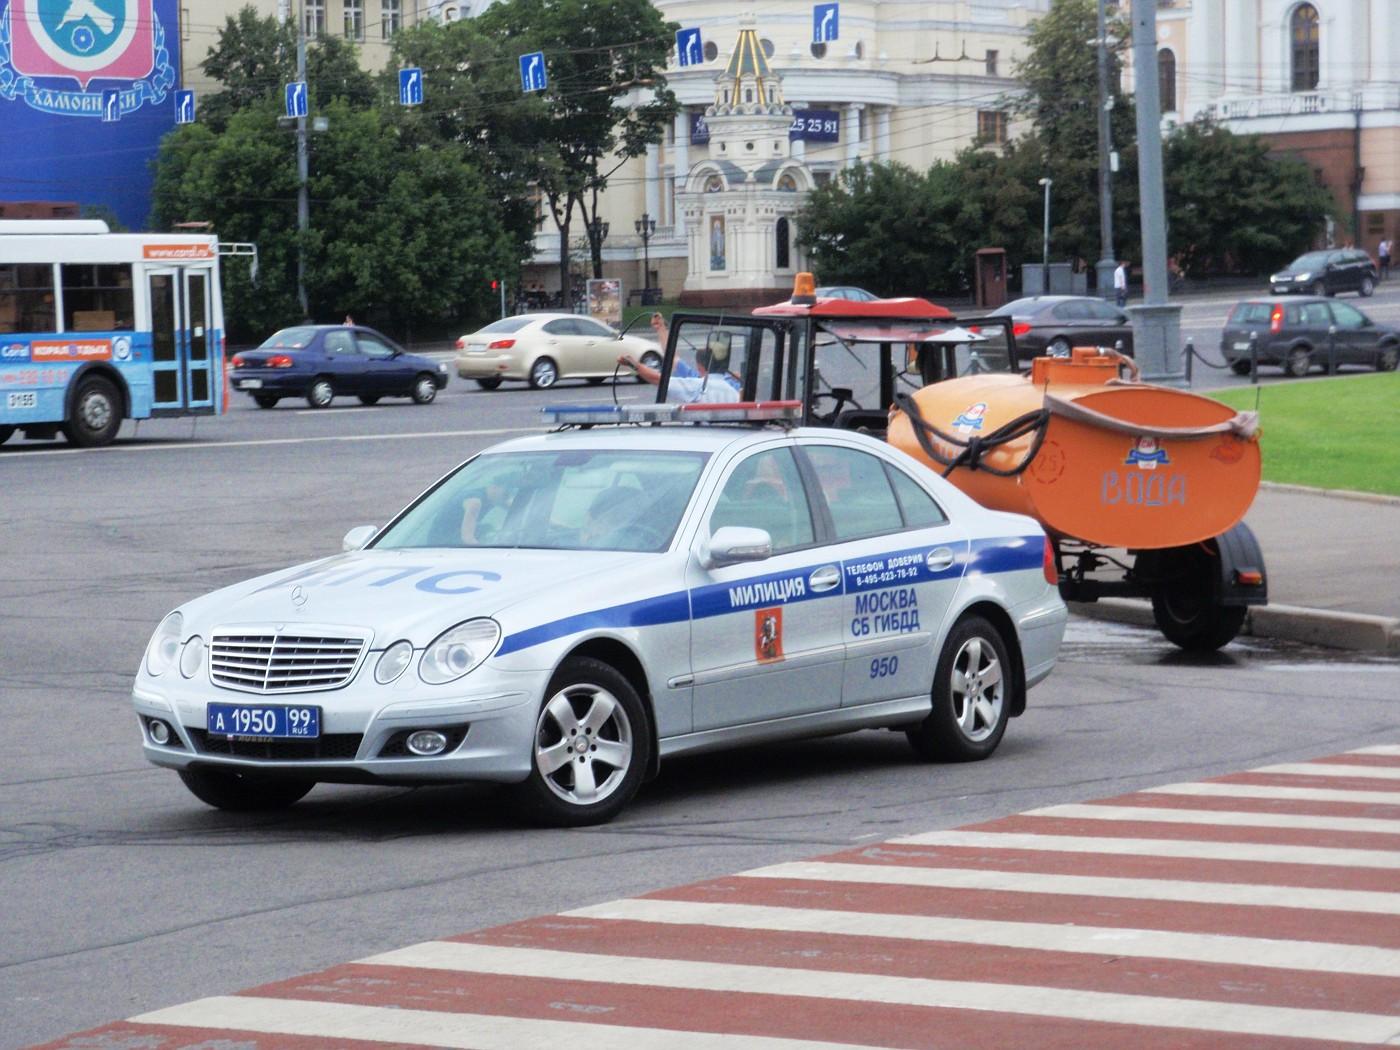 Moscow - City walks